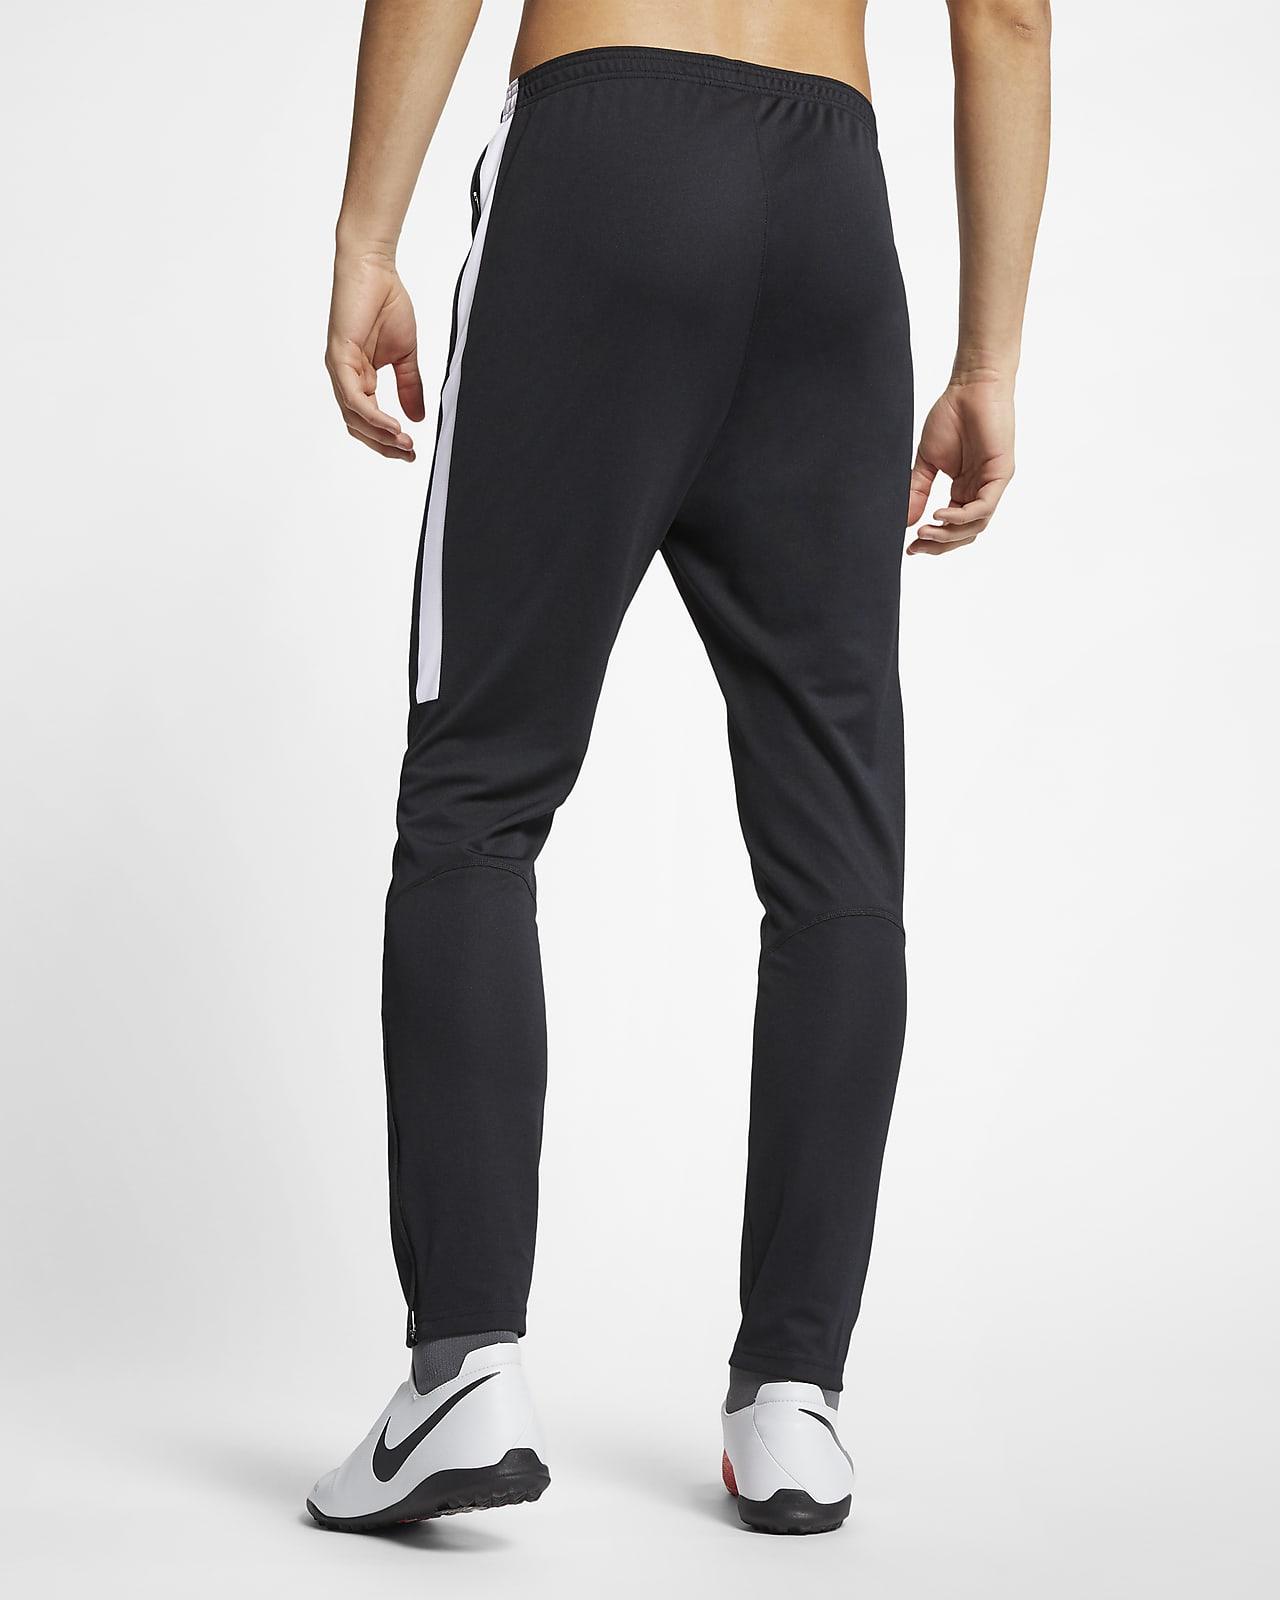 prefacio exceso Tranvía  Nike Dri-FIT Academy Men's Soccer Pants. Nike.com